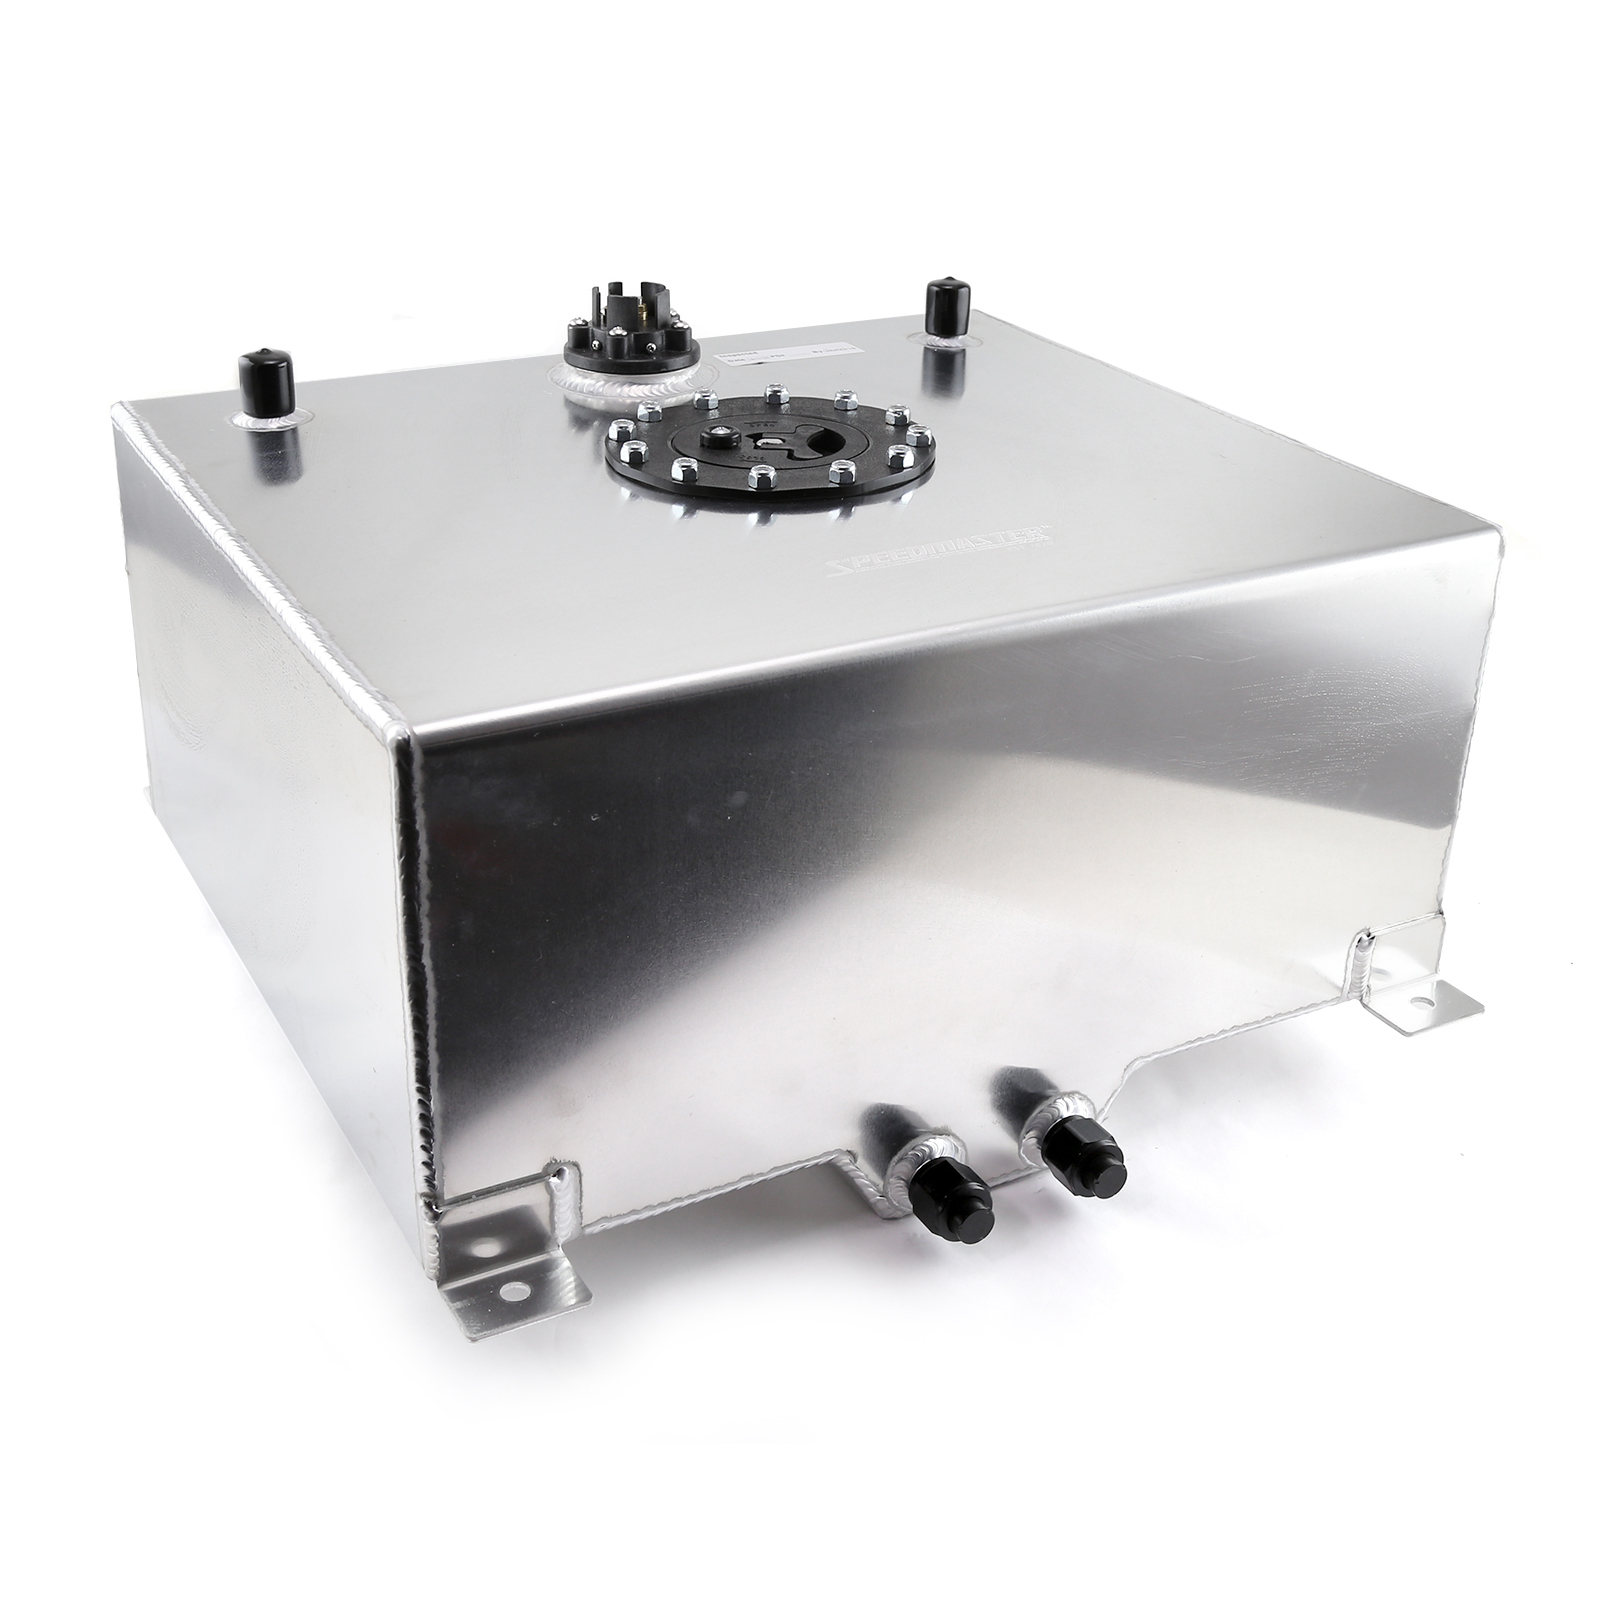 Speedmaster 13 Gallon / 50 Litre Aluminum Fuel Cell w/Sending Unit